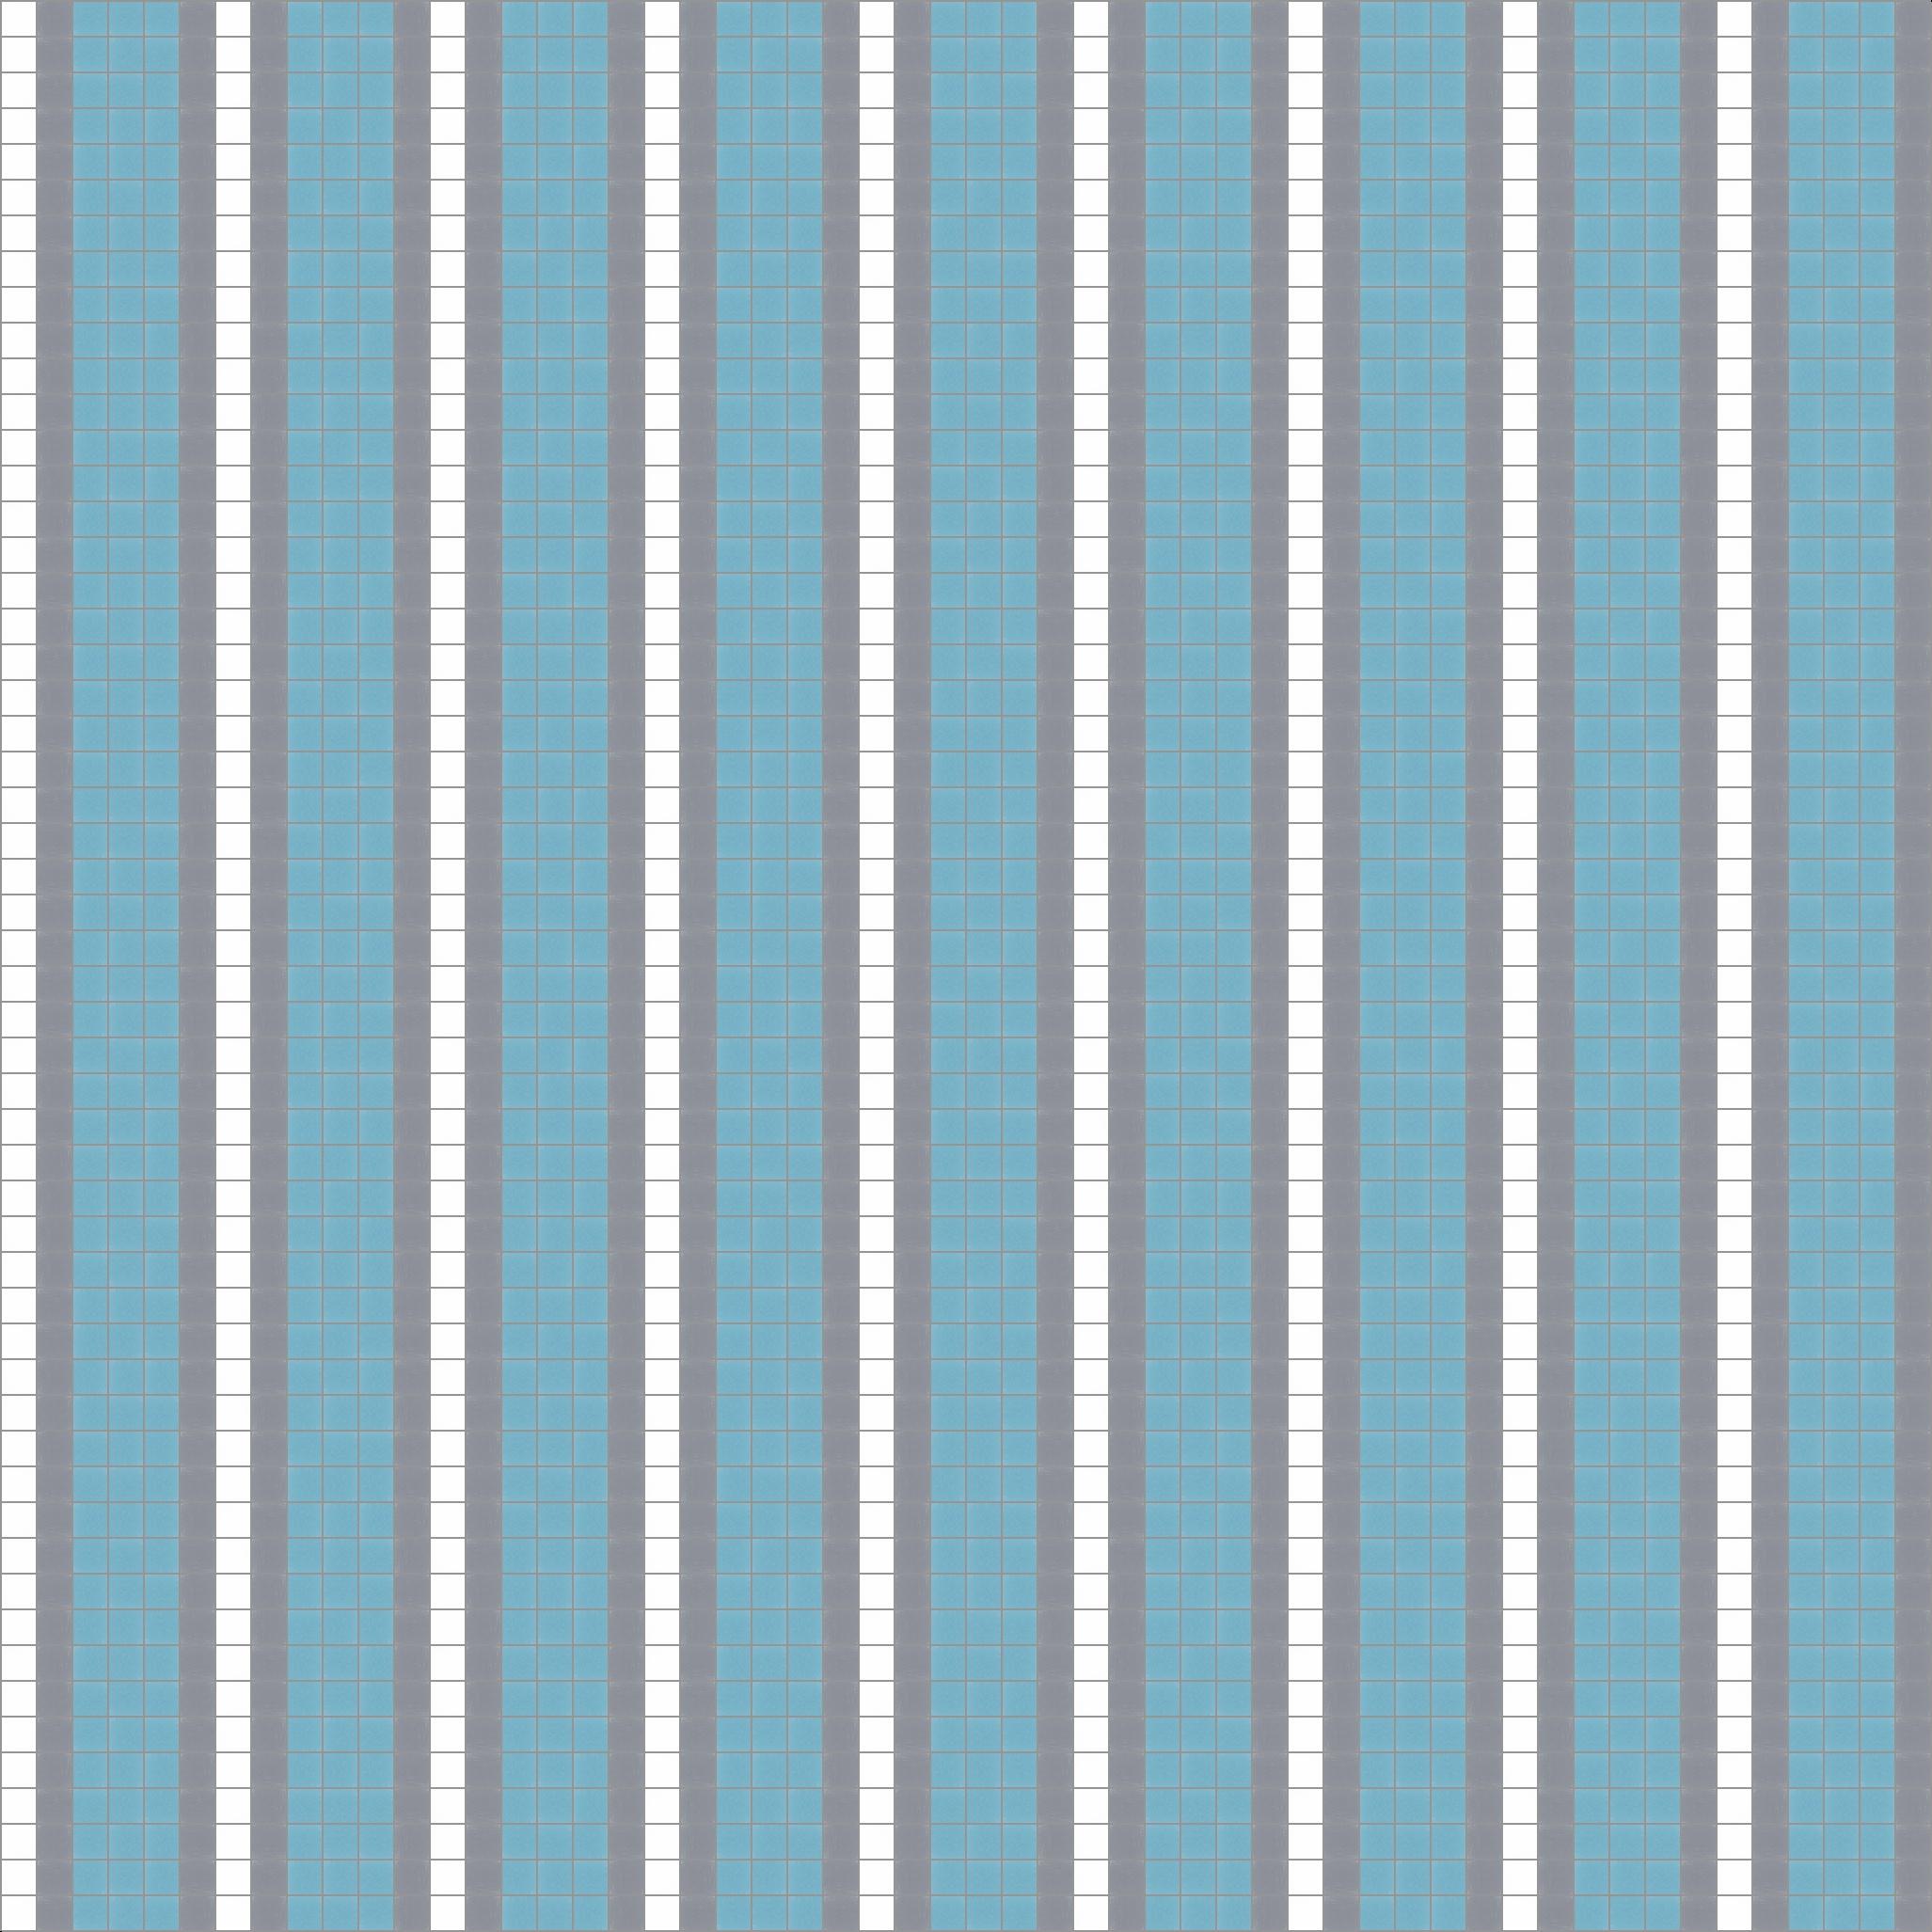 Traditional Striped Mosaic Tile Pattern | Modern Design | Mosaic ...